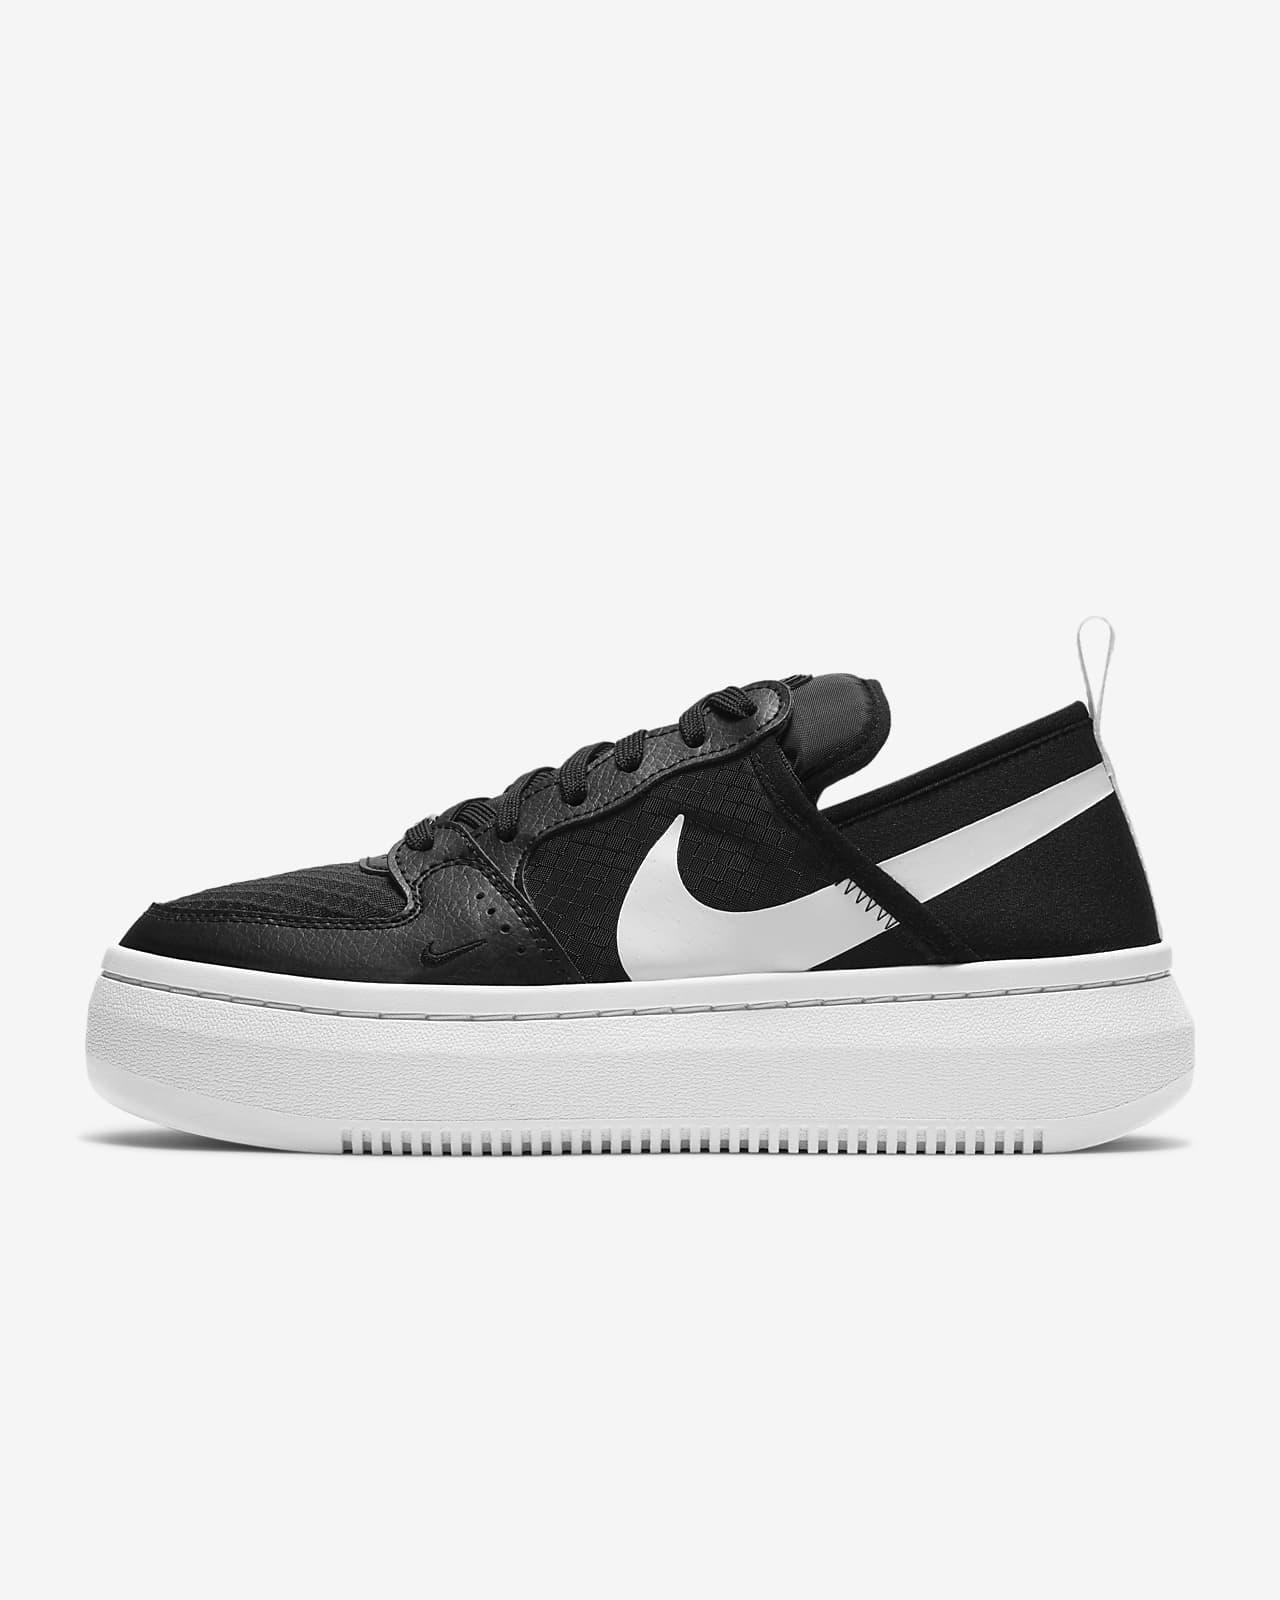 Nike Court Vision Alta Women's Shoes